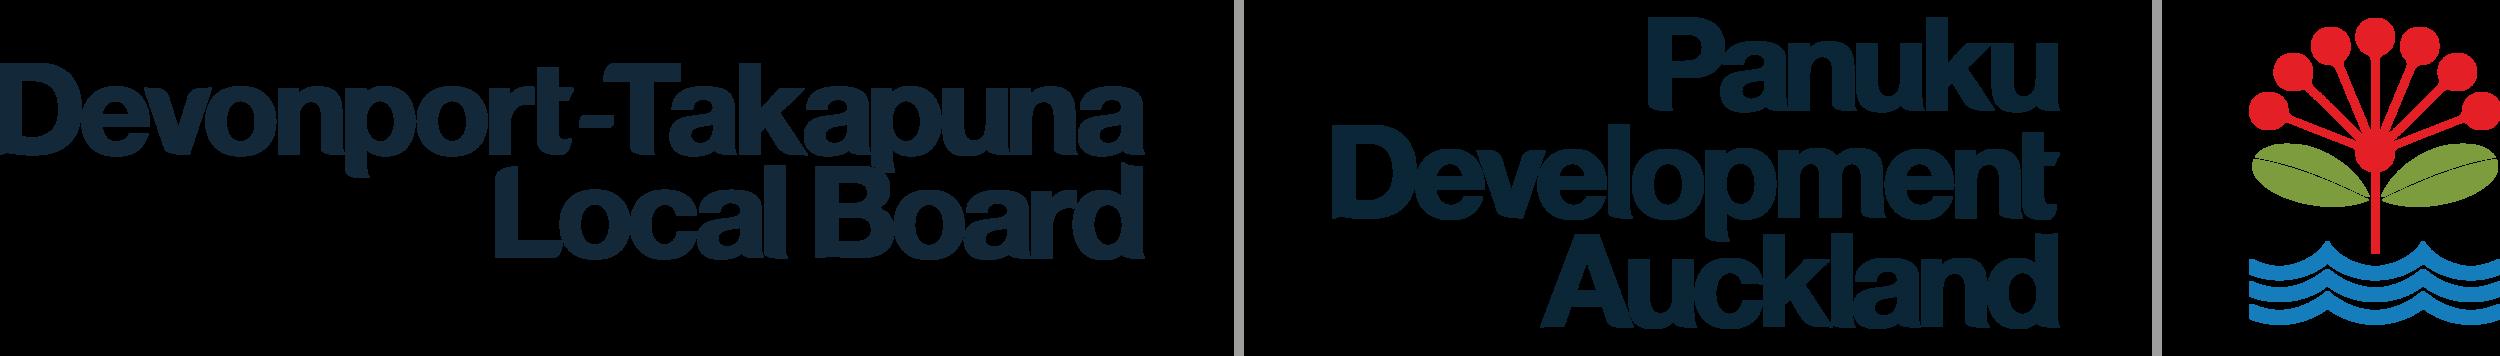 Panuku-Devonport_Logo_Colour@4x.png